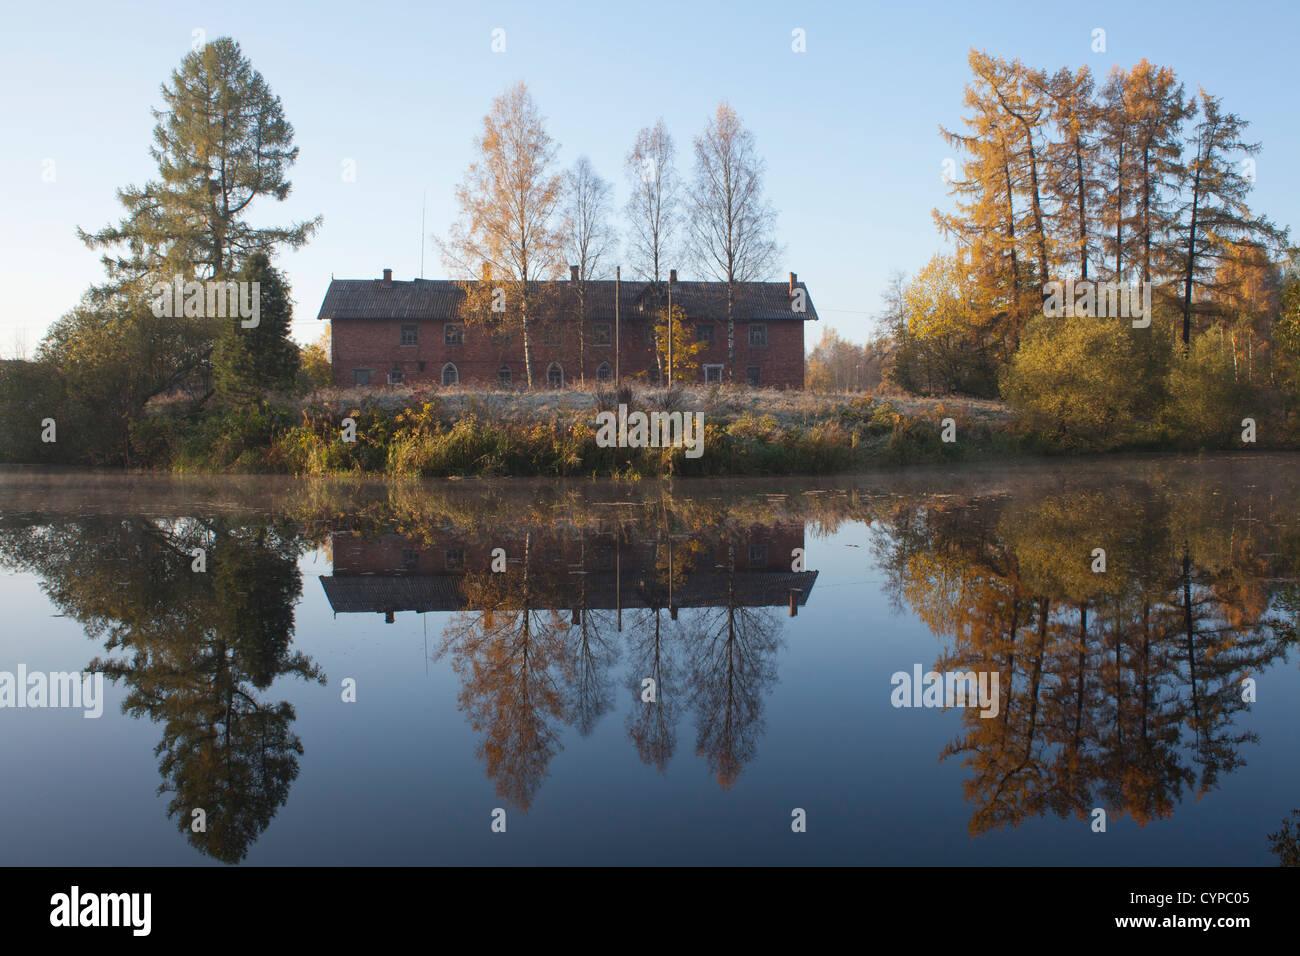 Priyutino, Leningrad Oblast, Russia. - Stock Image